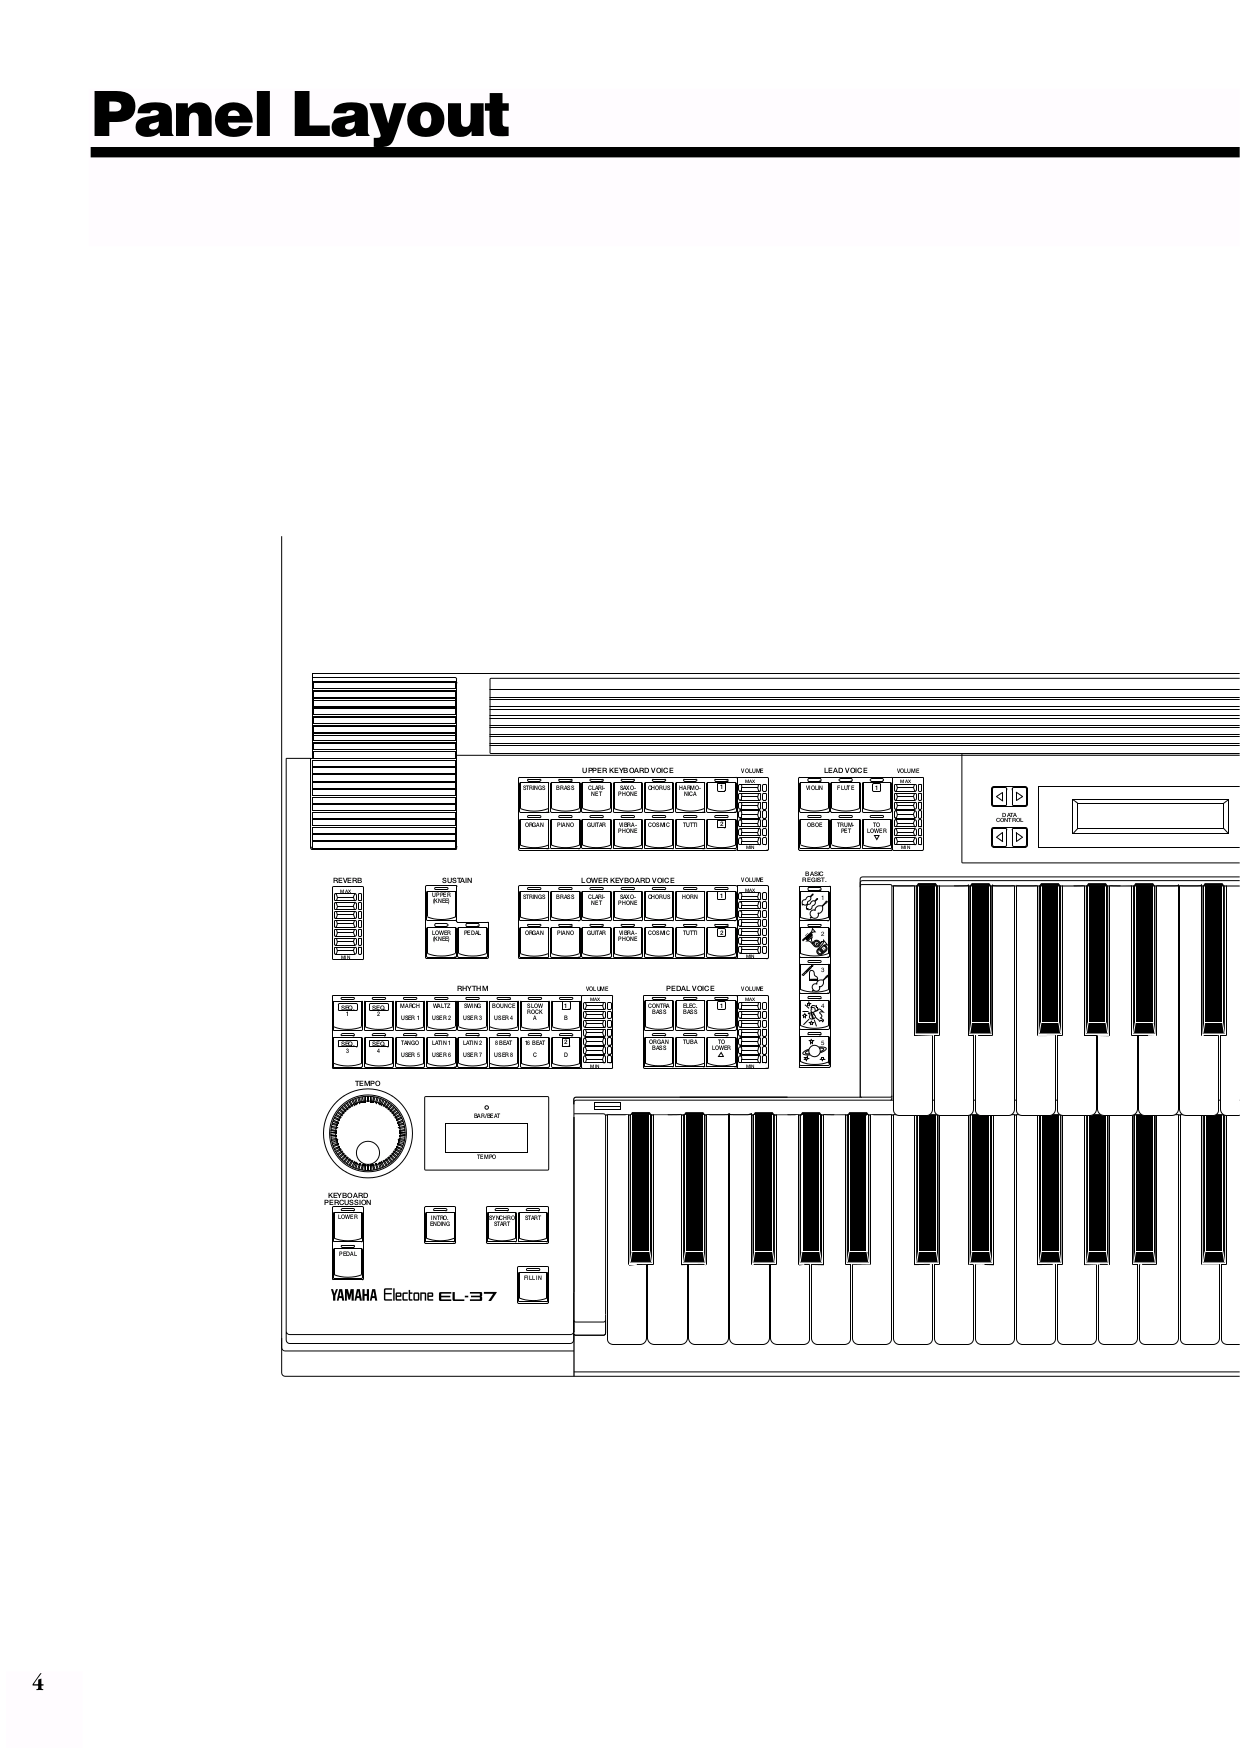 PDF manual for Yamaha Music Keyboard EL-3